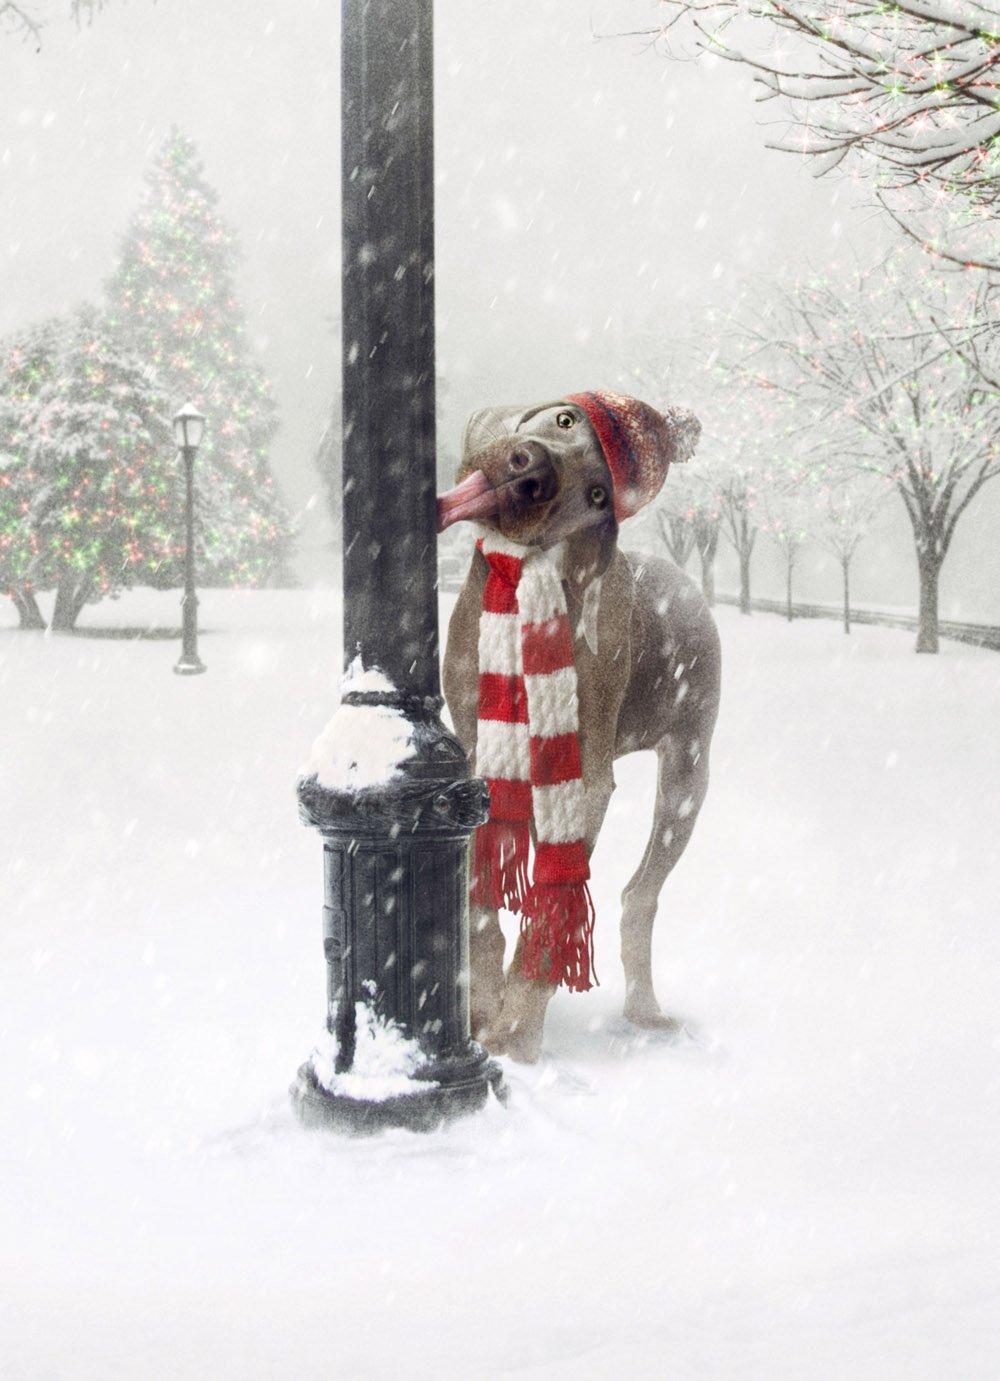 Amazon.com : Avanti Press 32528 Christmas Cards, Frozen Greetings ...